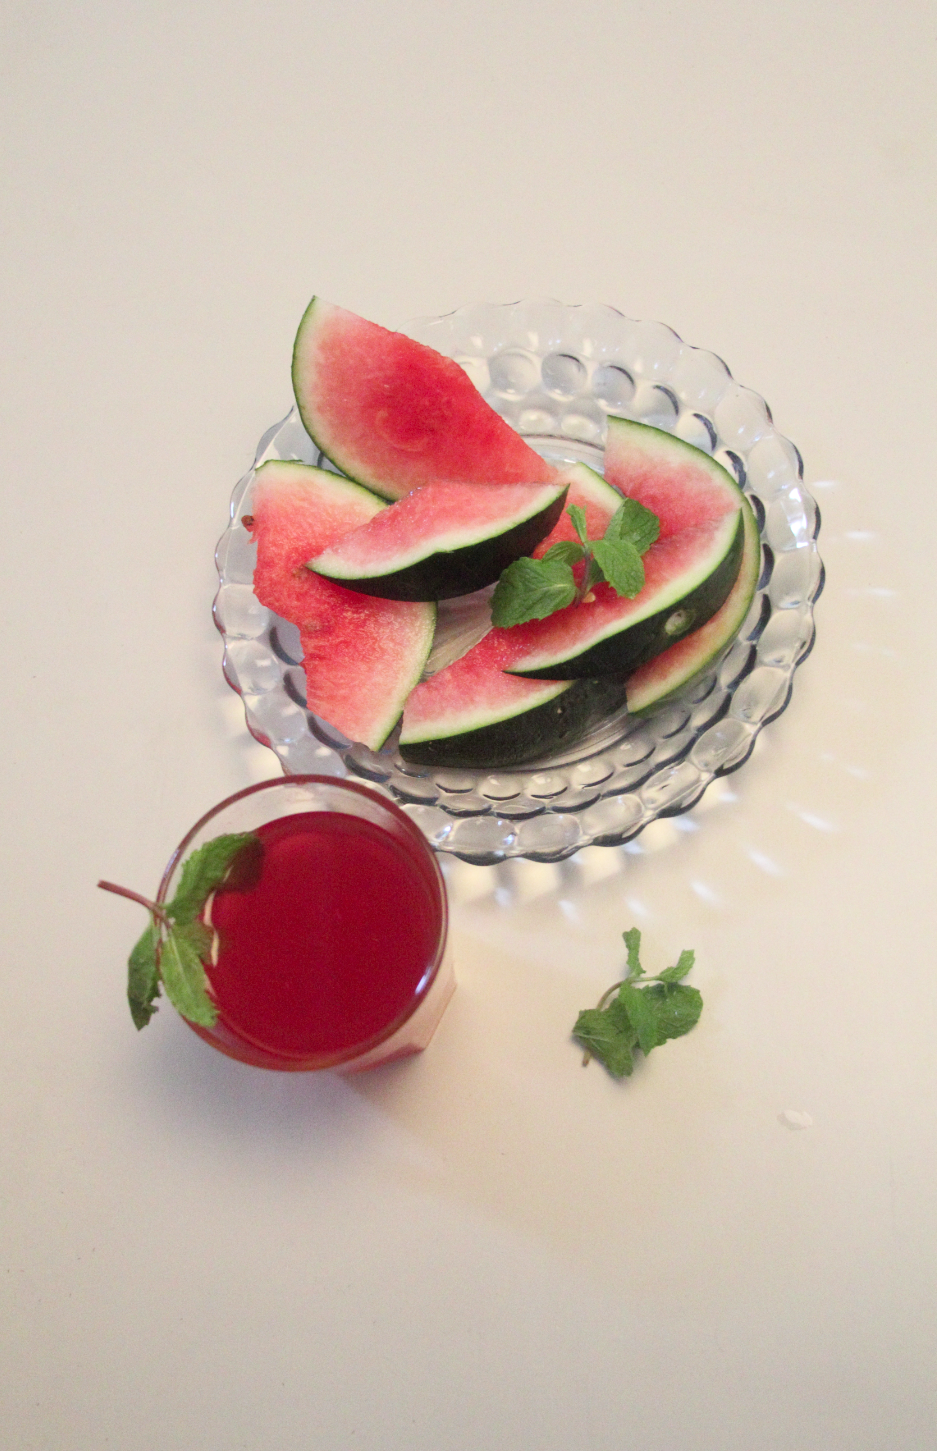 How to make minty watermelon juice